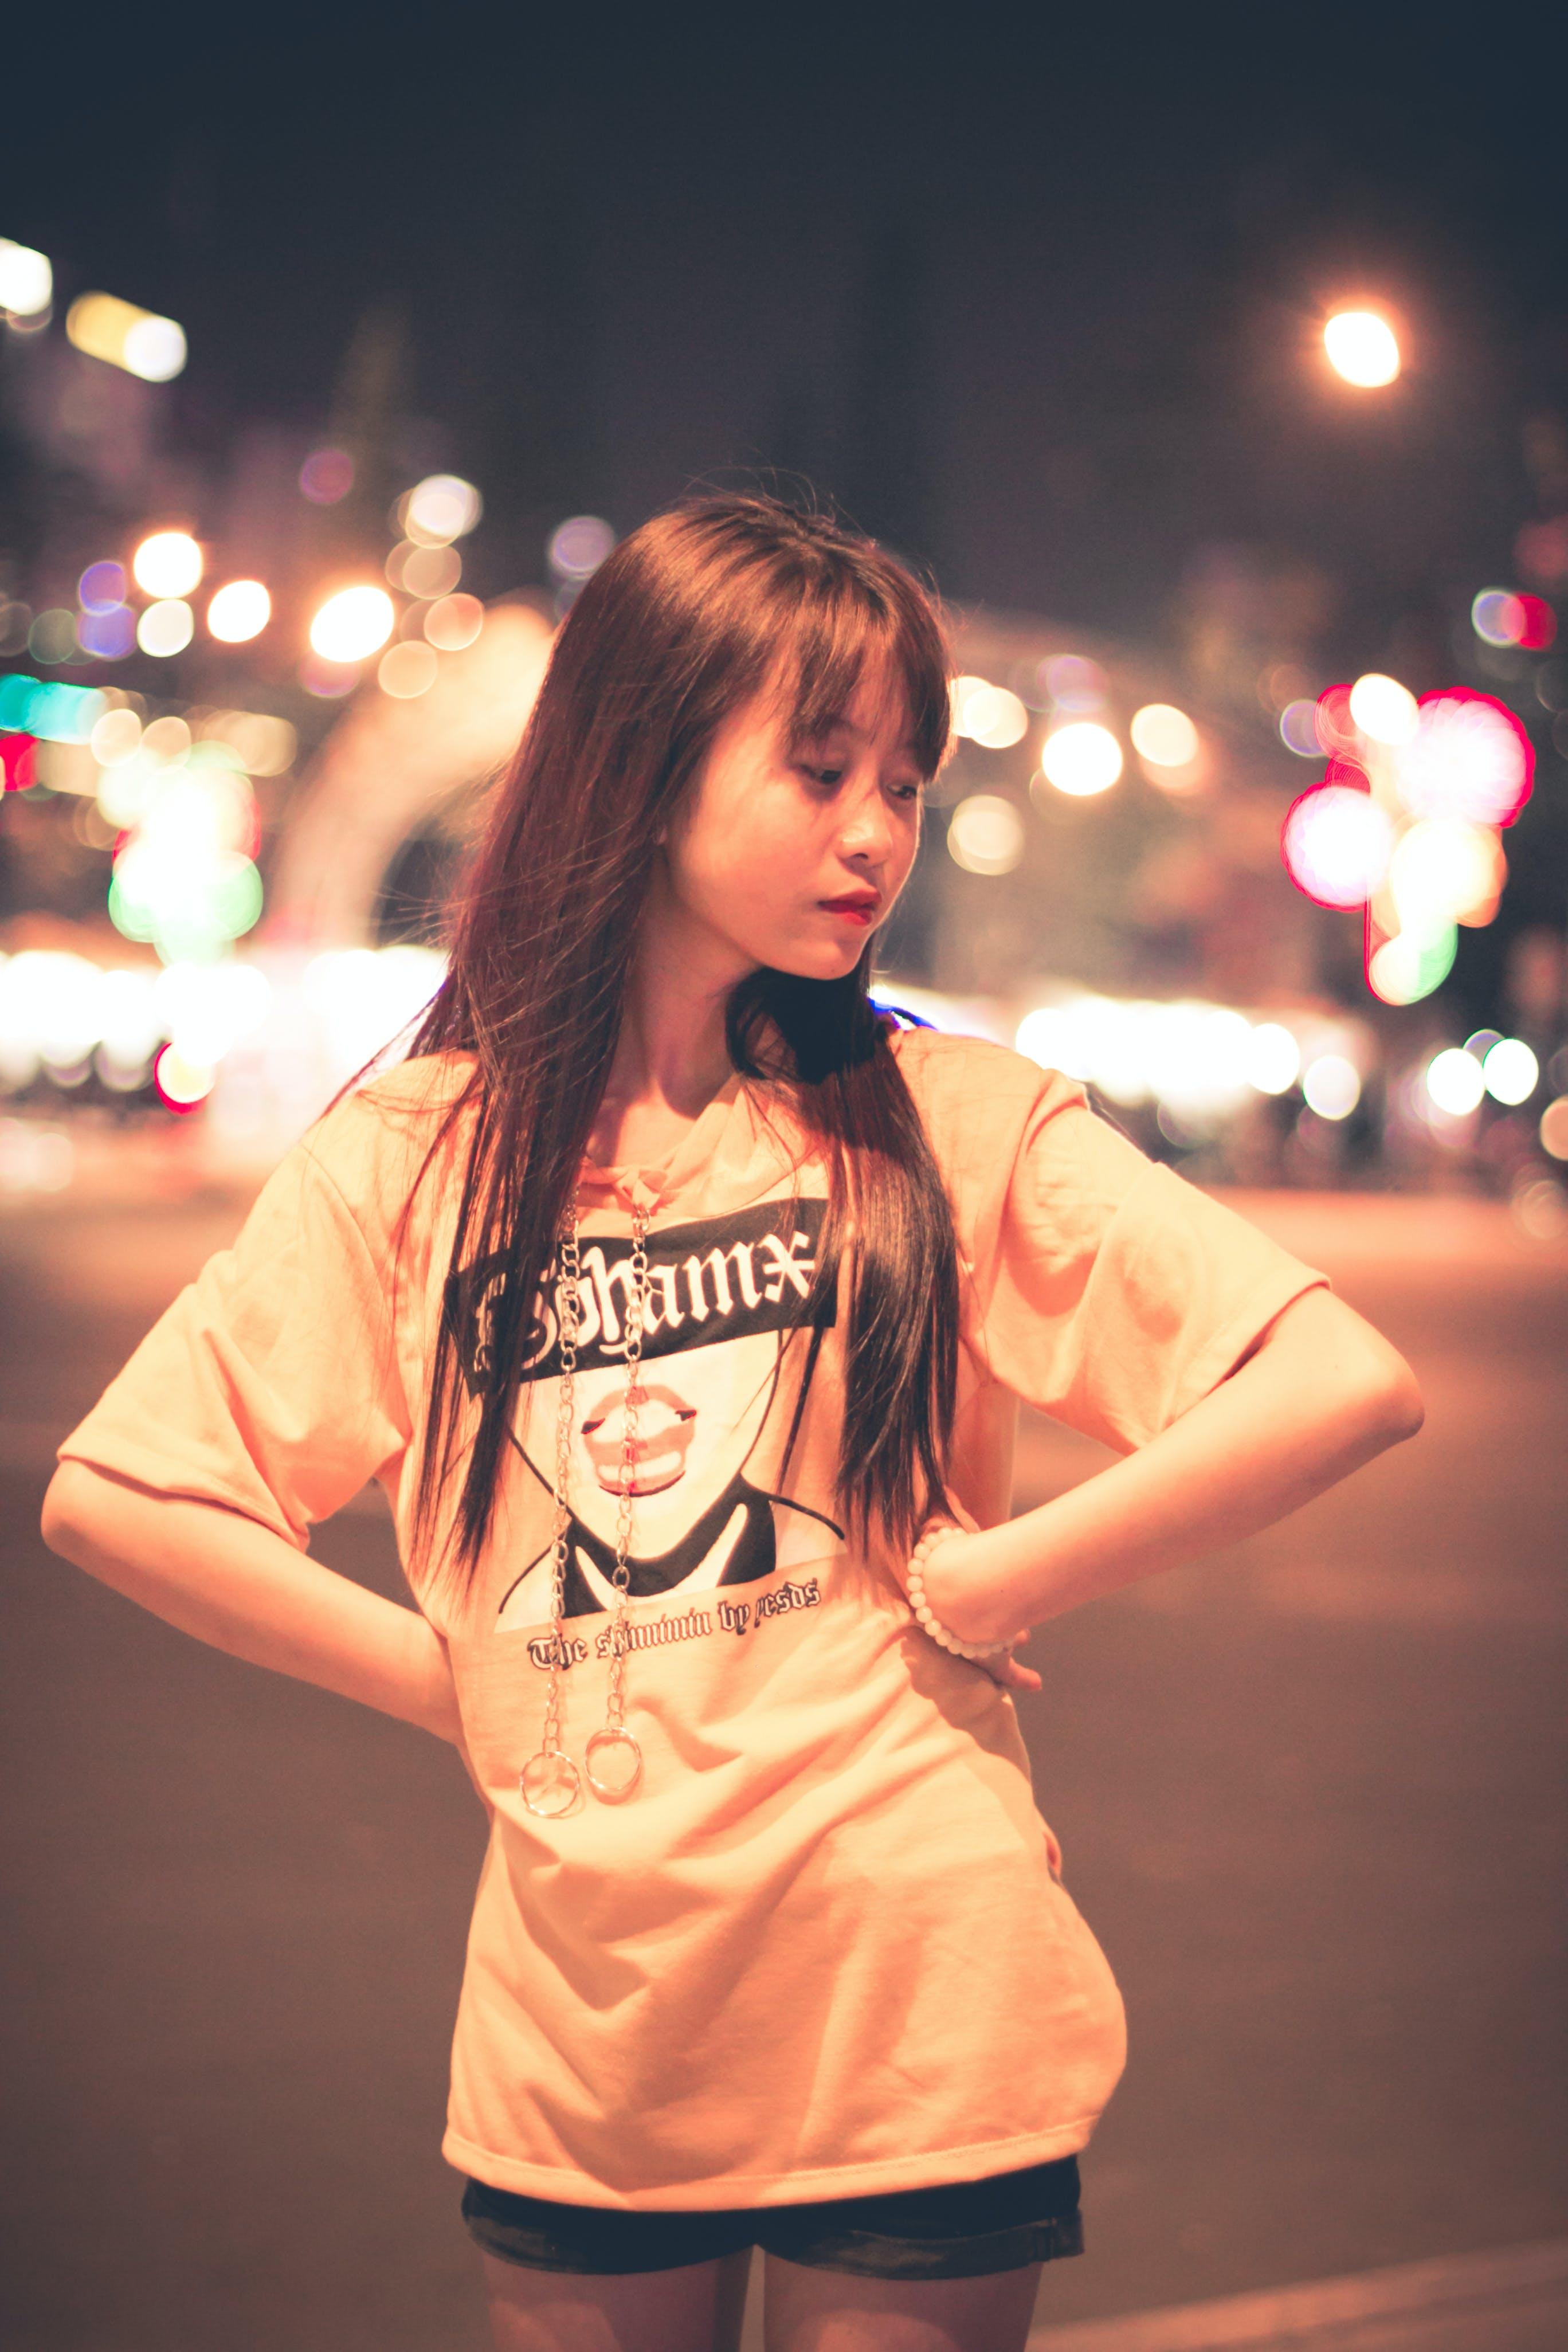 Woman Wears Orange Short-sleeved Shirt